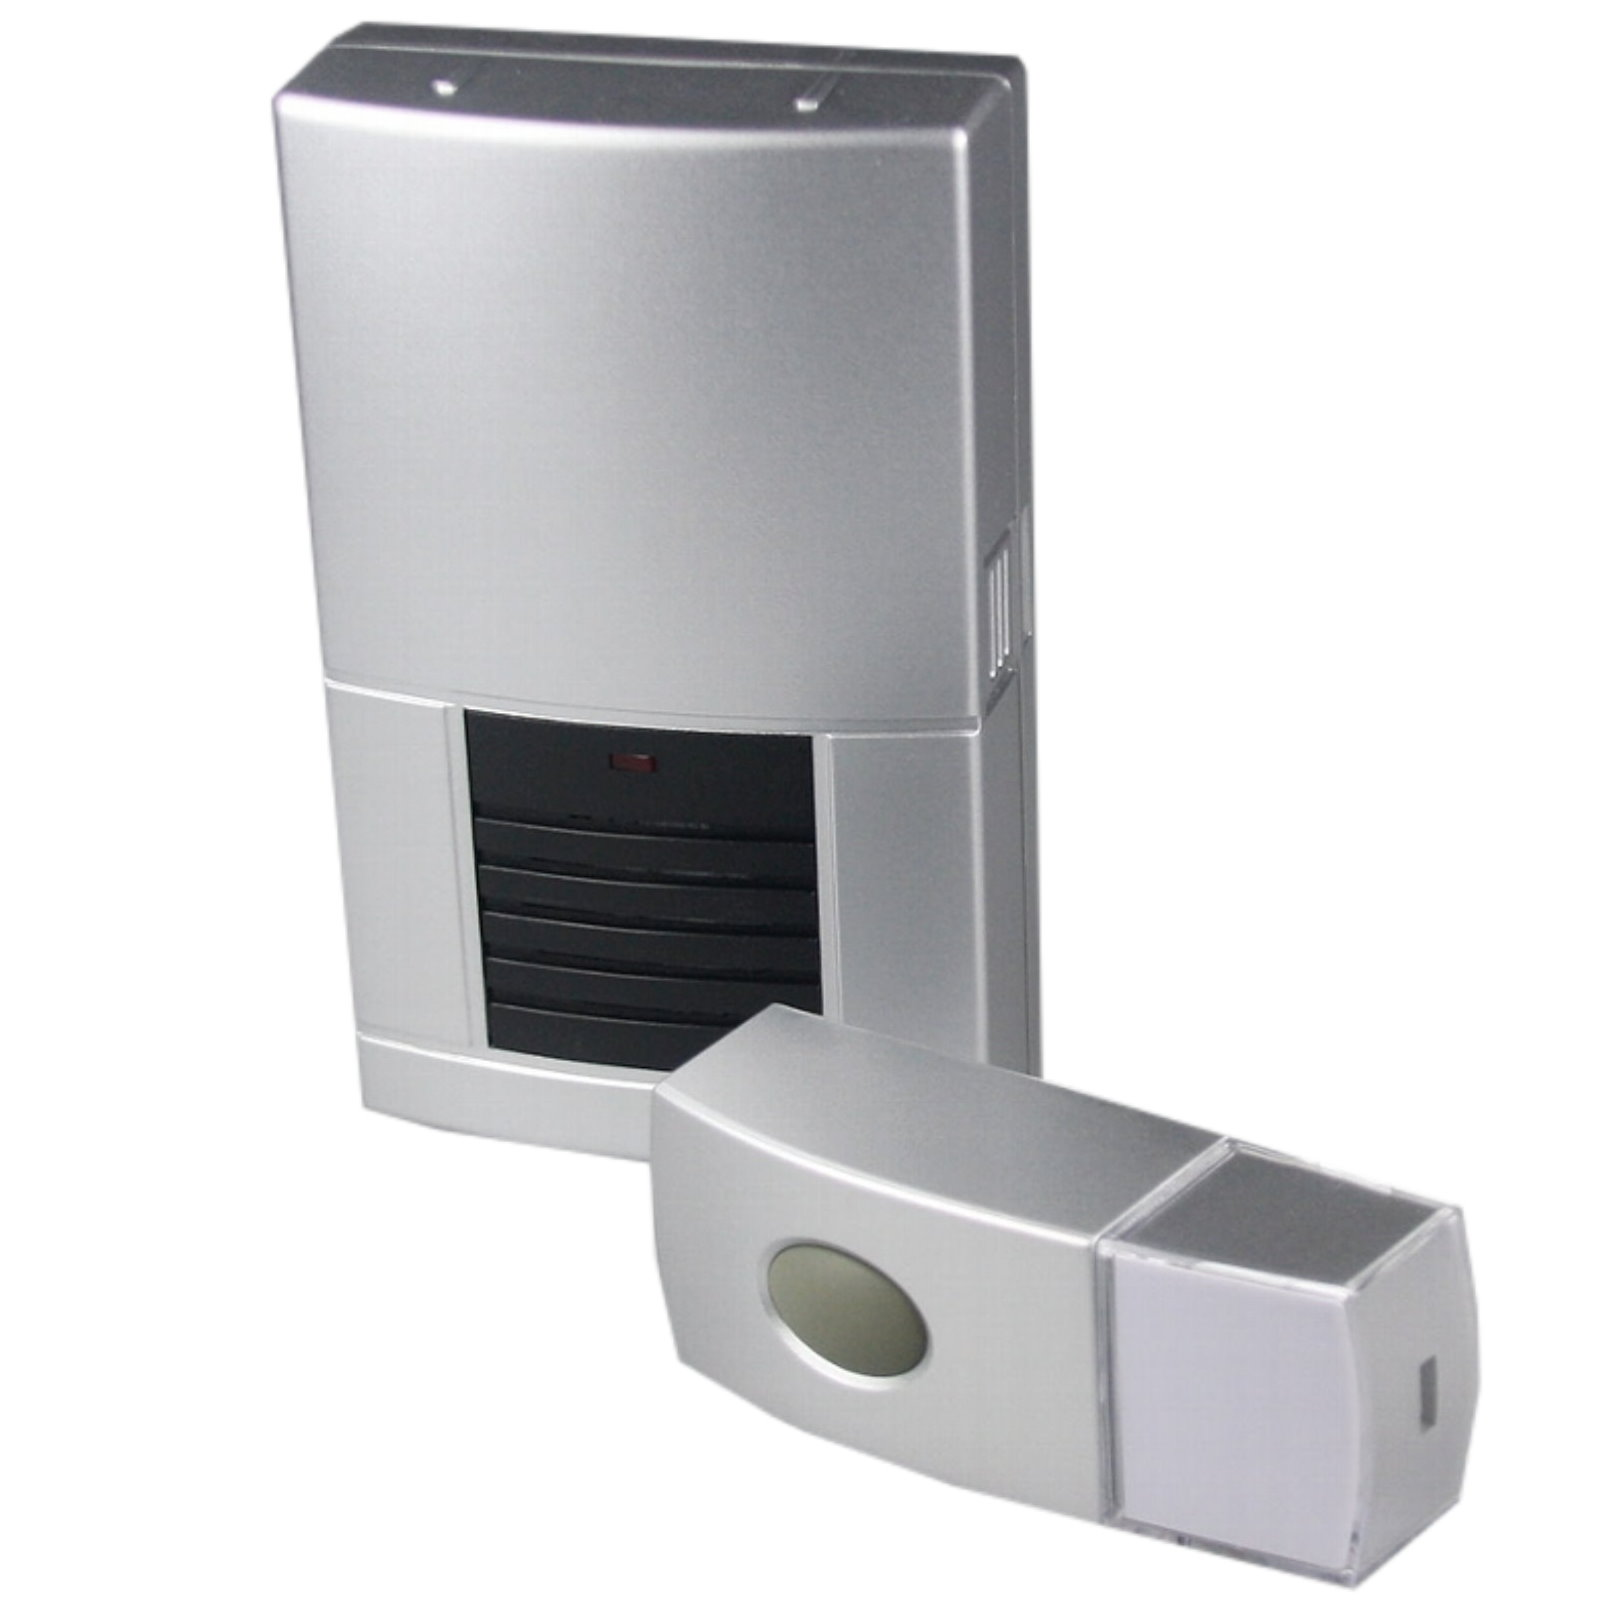 gev heitronic wireless t rgong t r gong klingel funkklingel doorbell batterie ebay. Black Bedroom Furniture Sets. Home Design Ideas